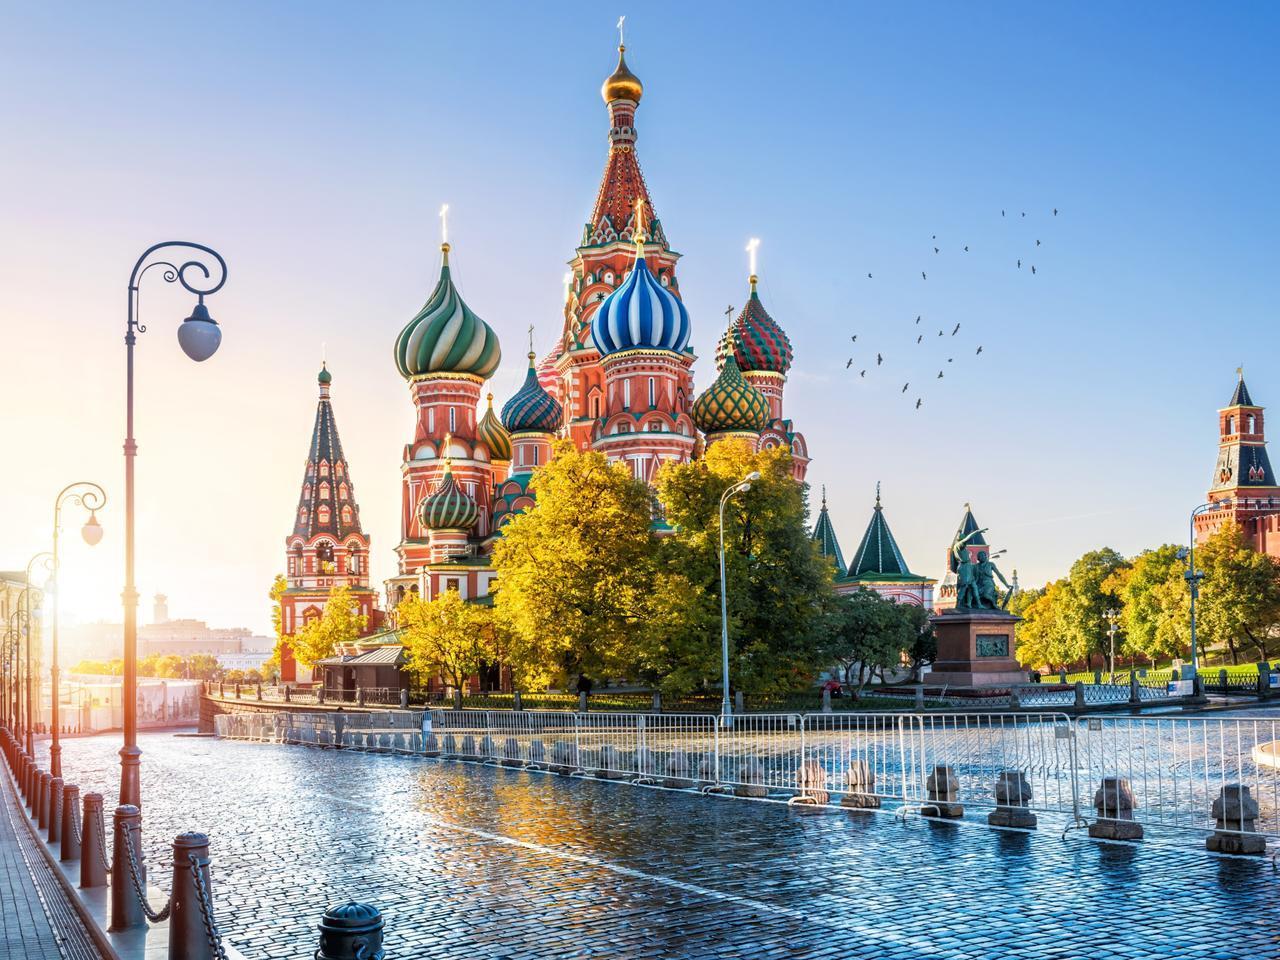 moscow aviatickets - ავიაბილეთები მოსკოვი